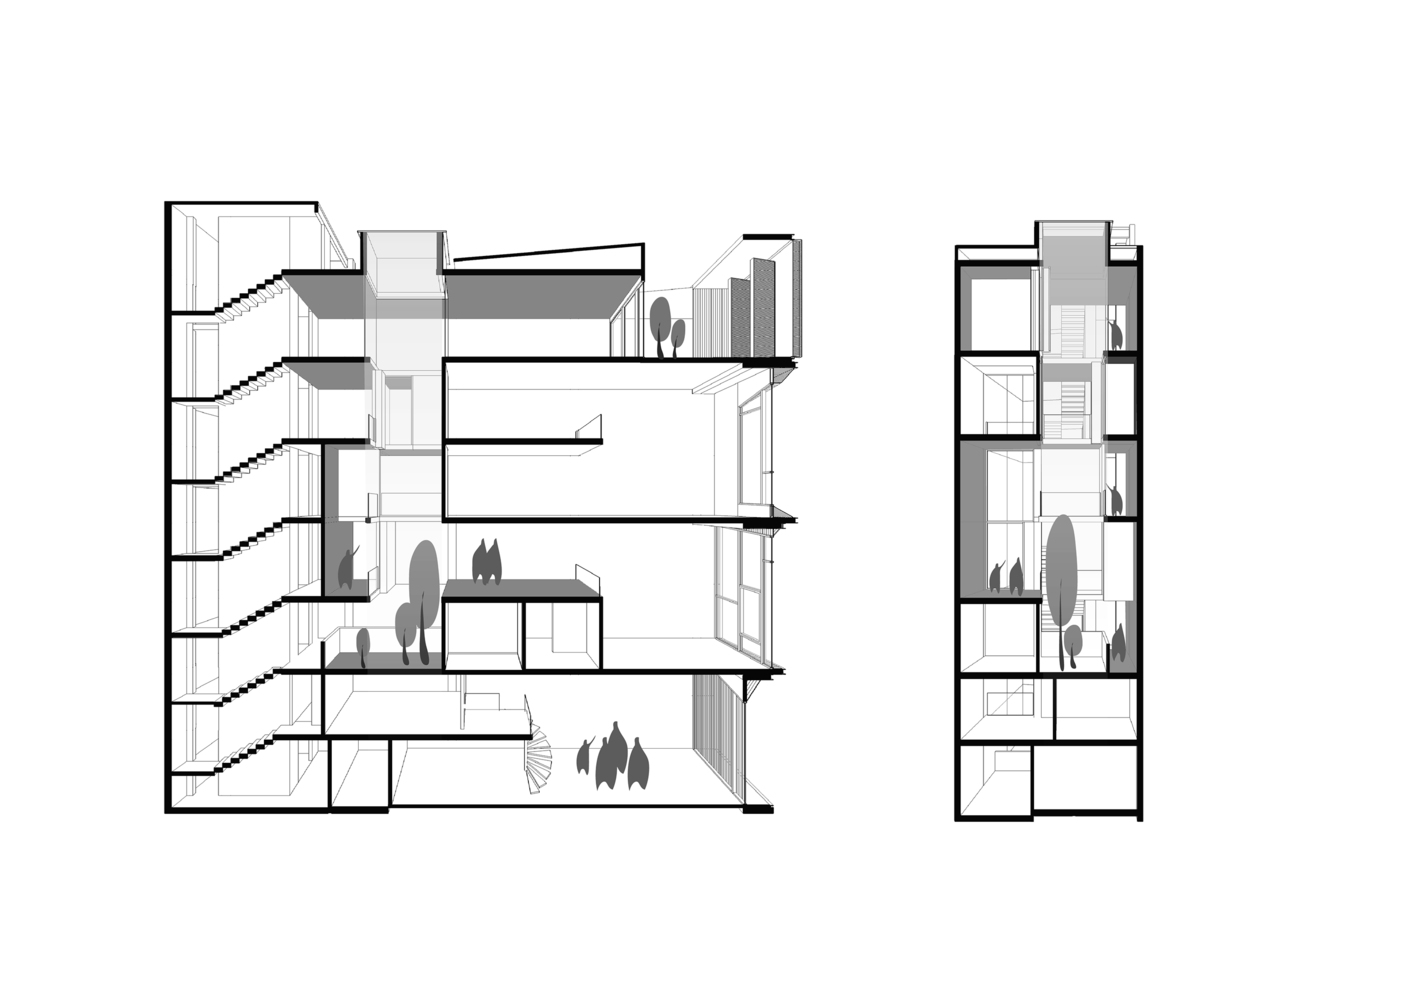 House Diagram - Colakork.net